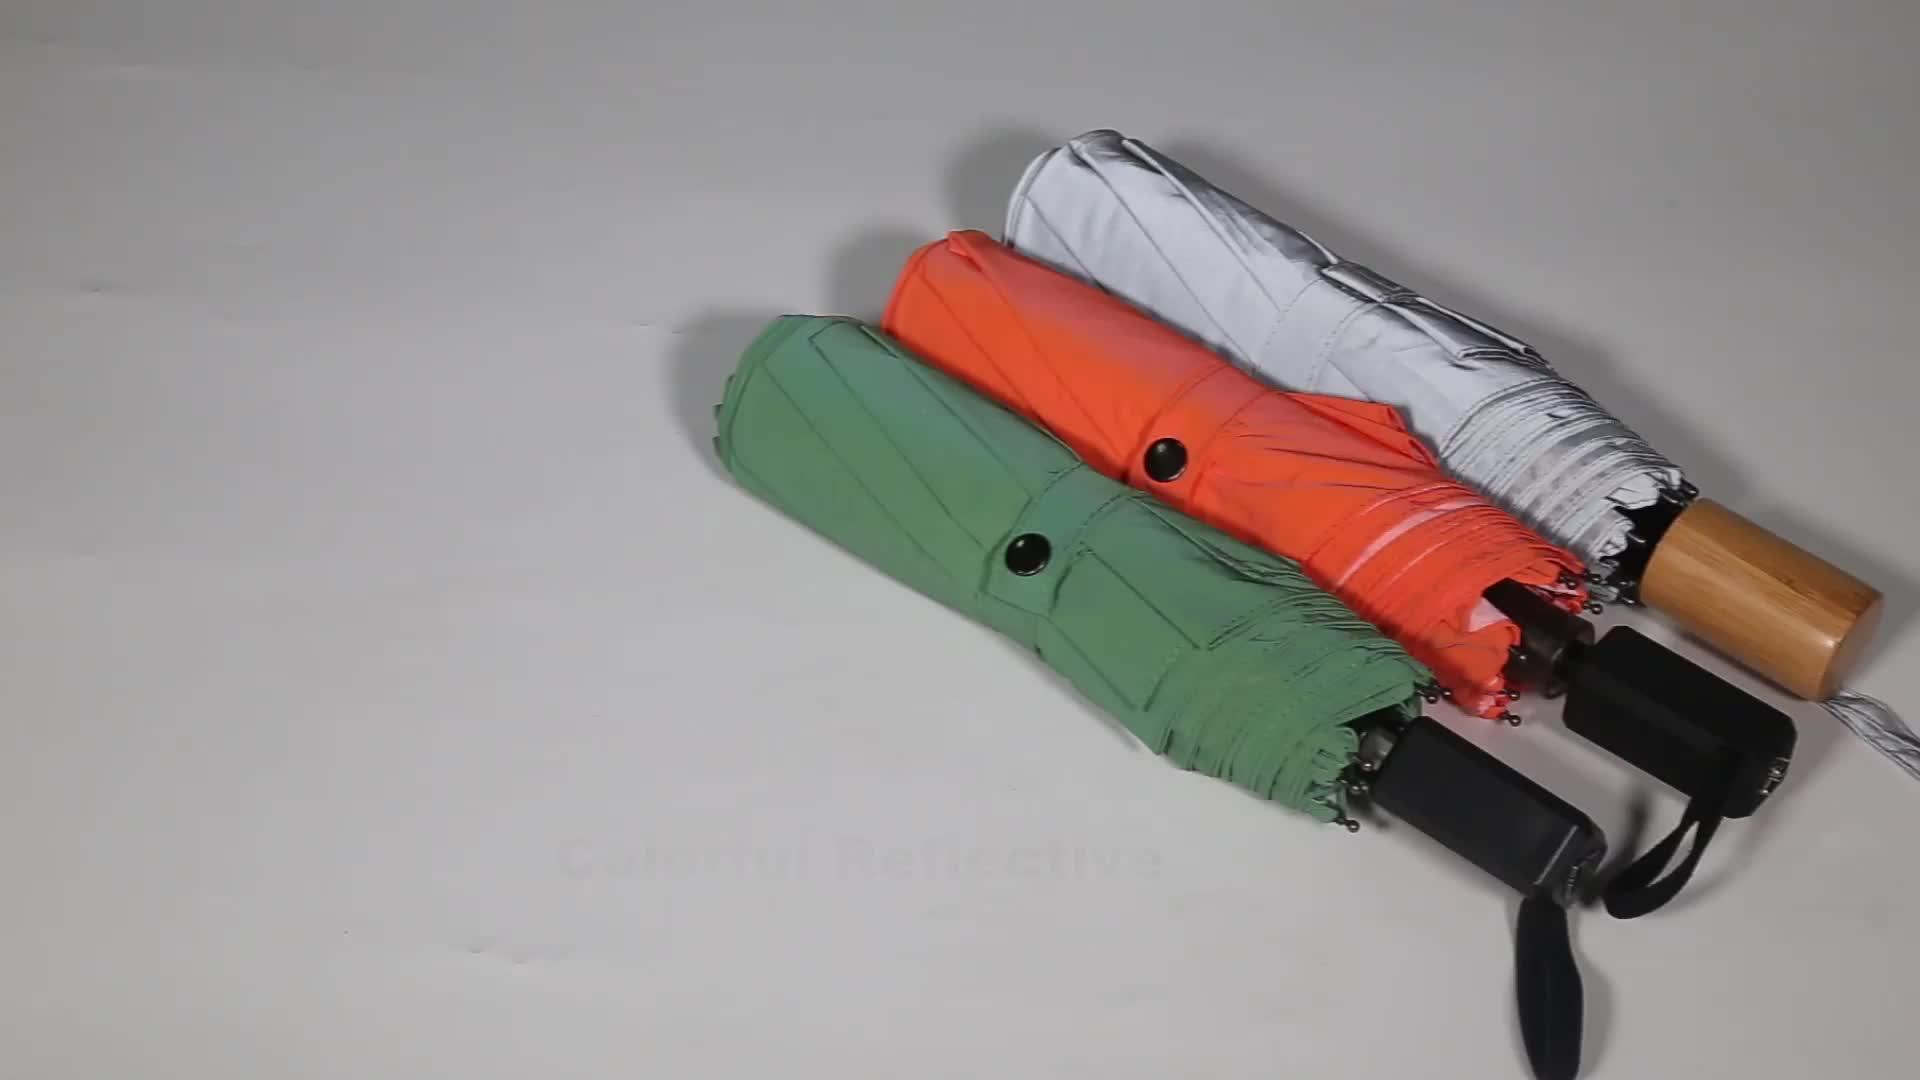 Hoge kwaliteit reflecterende chinese paraplu